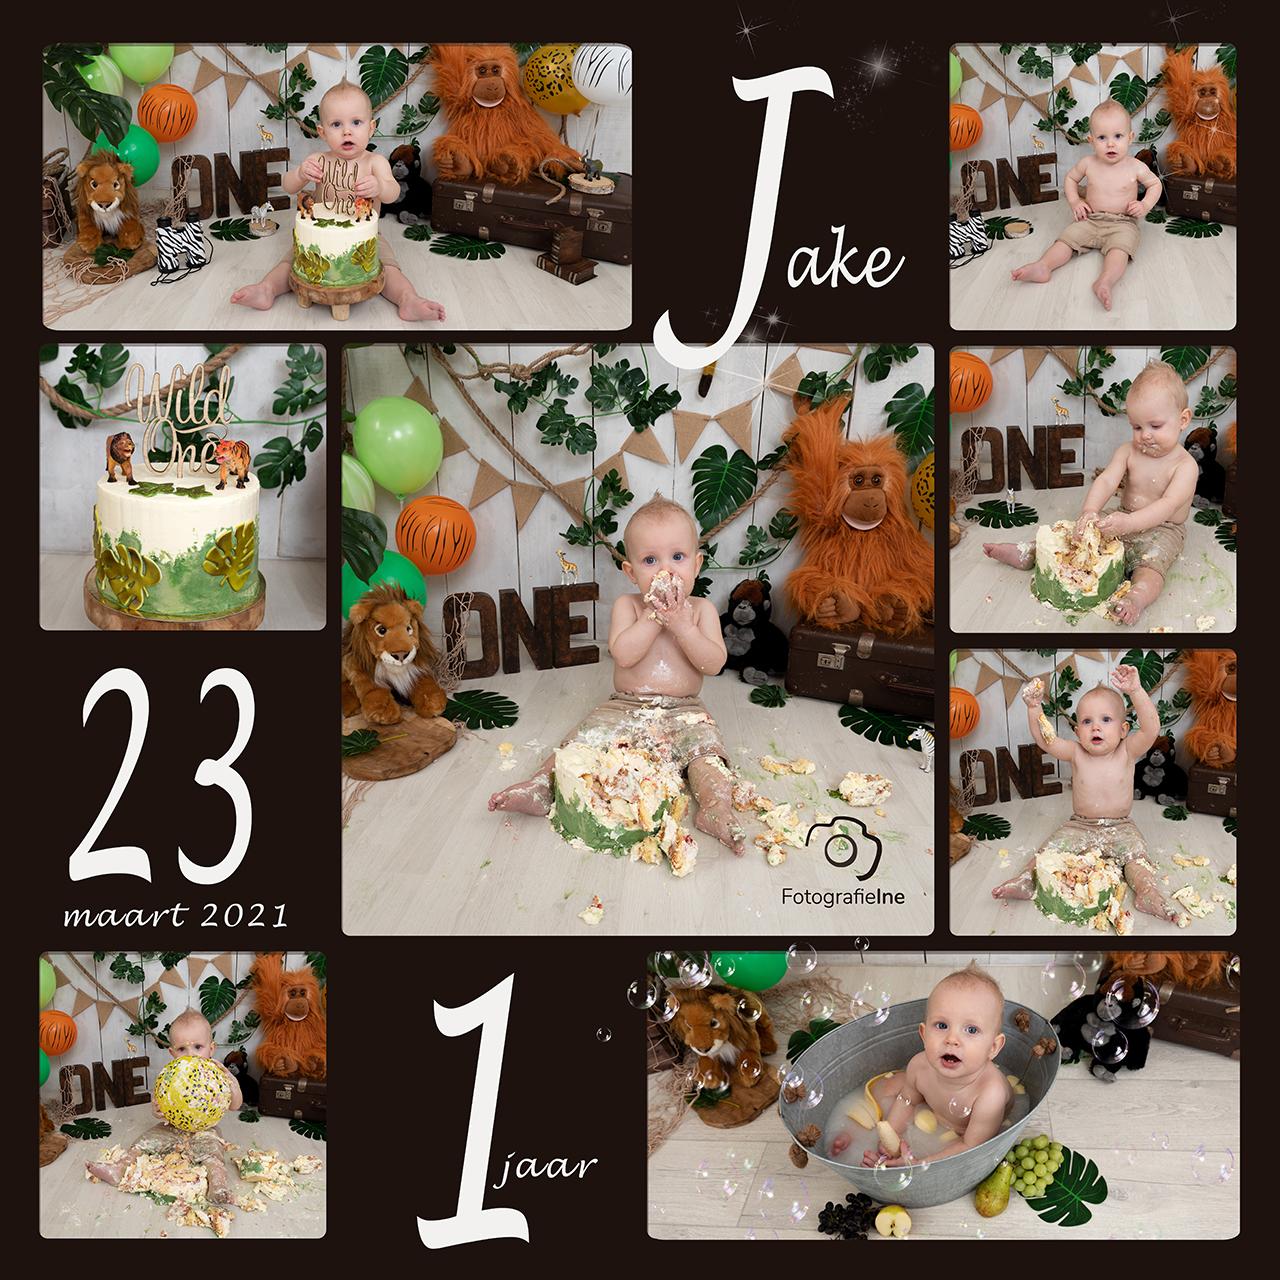 Fotografie Ine collage cakesmash Jake met logo